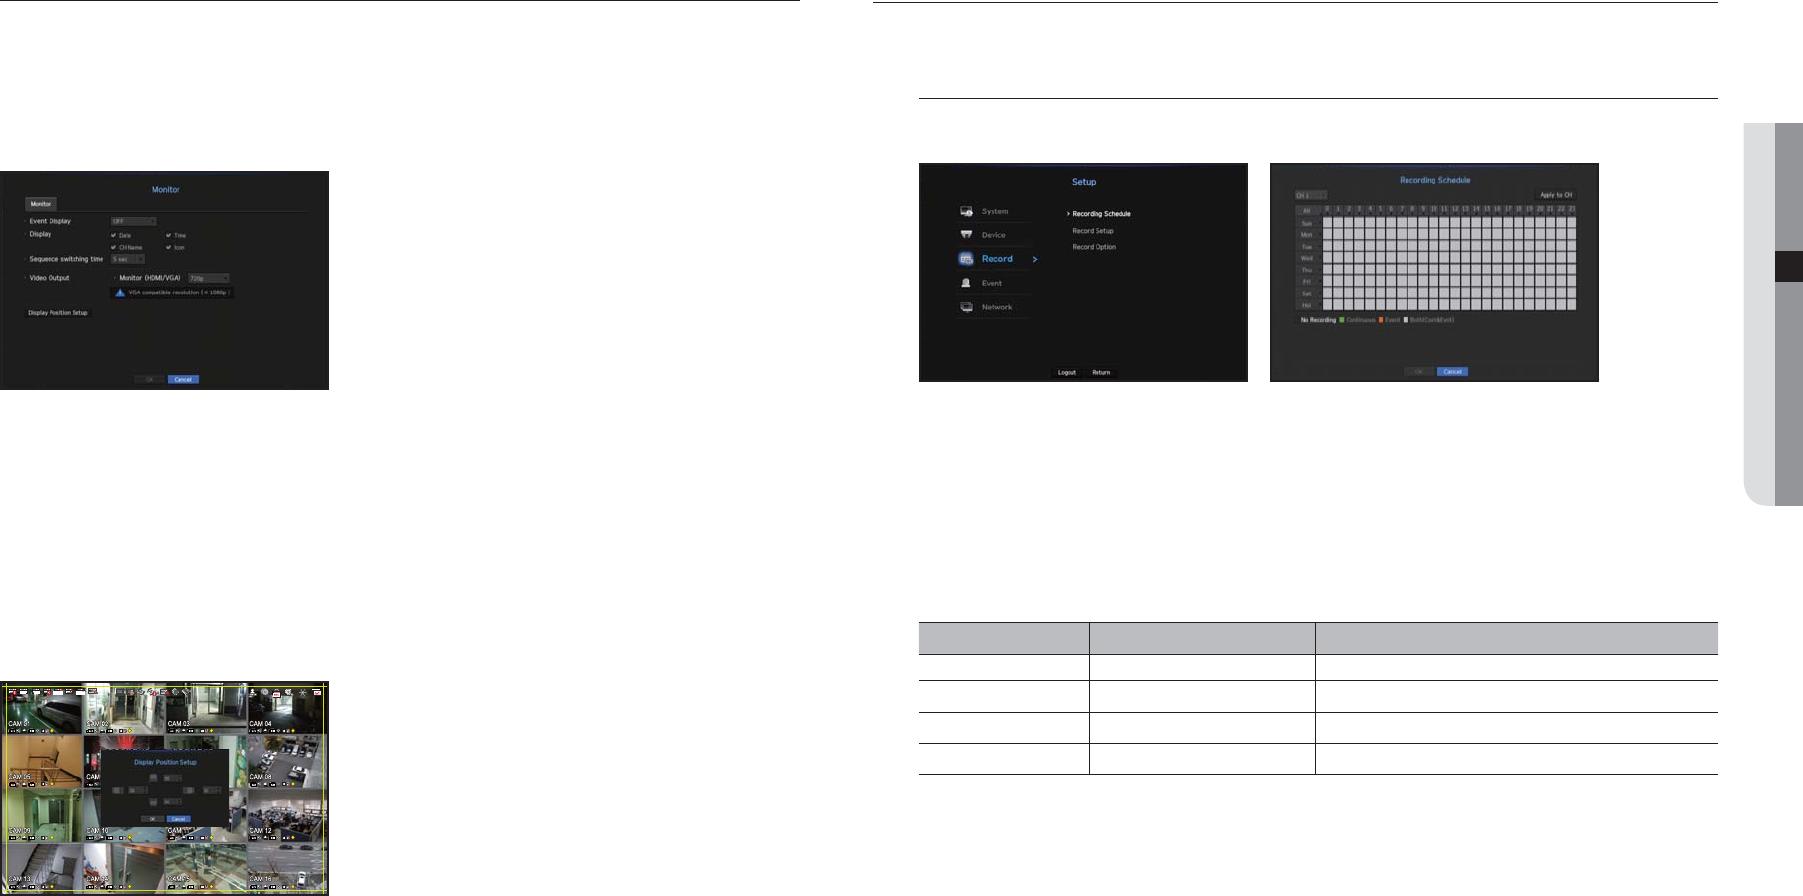 Hanwha Techwin TRM1610S NETWORK VIDEO RECORDER User Manual